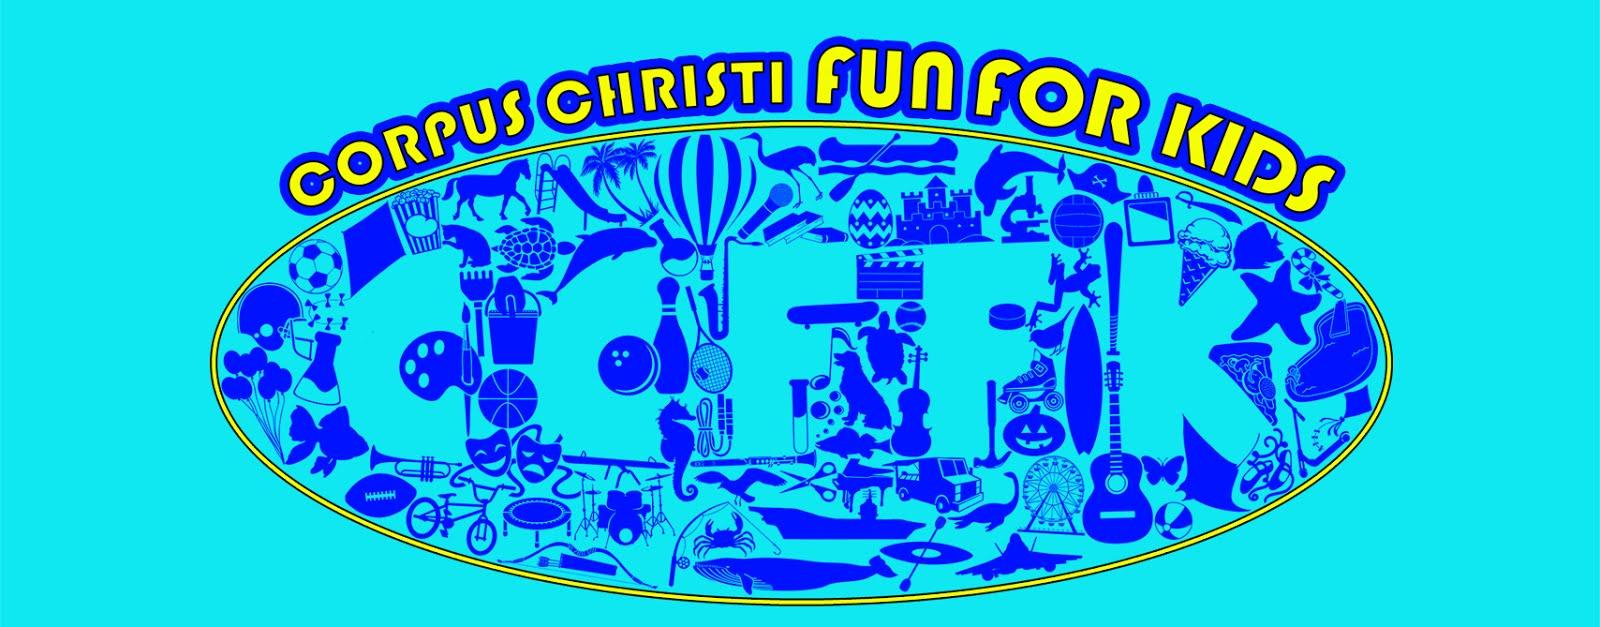 corpus christi fun for kids - Halloween Stores In Corpus Christi